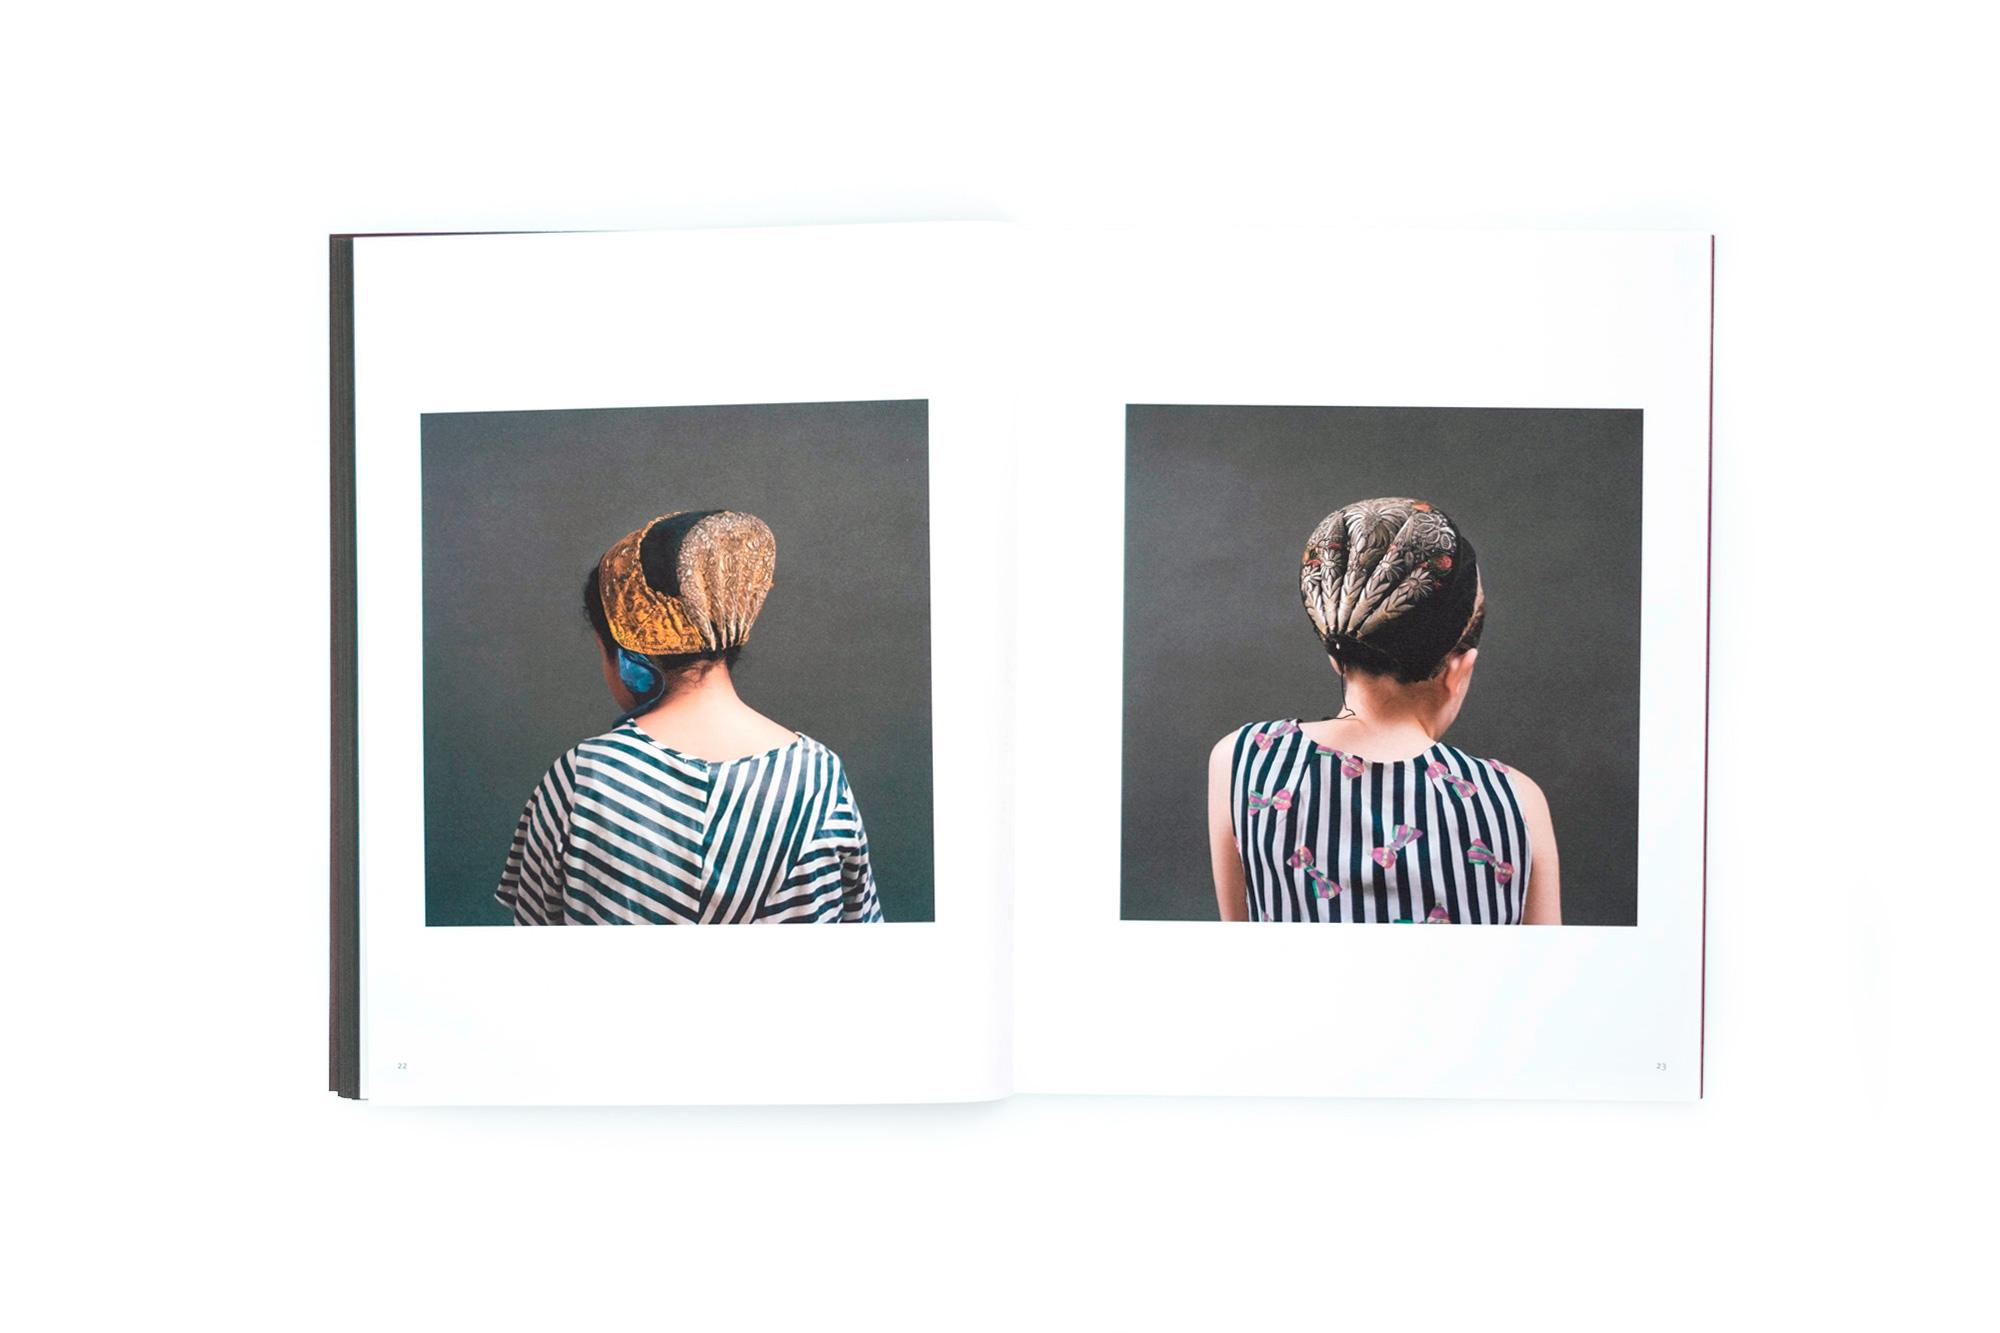 trine_sondergaard_muma_lumieres_nordique_book_spread2